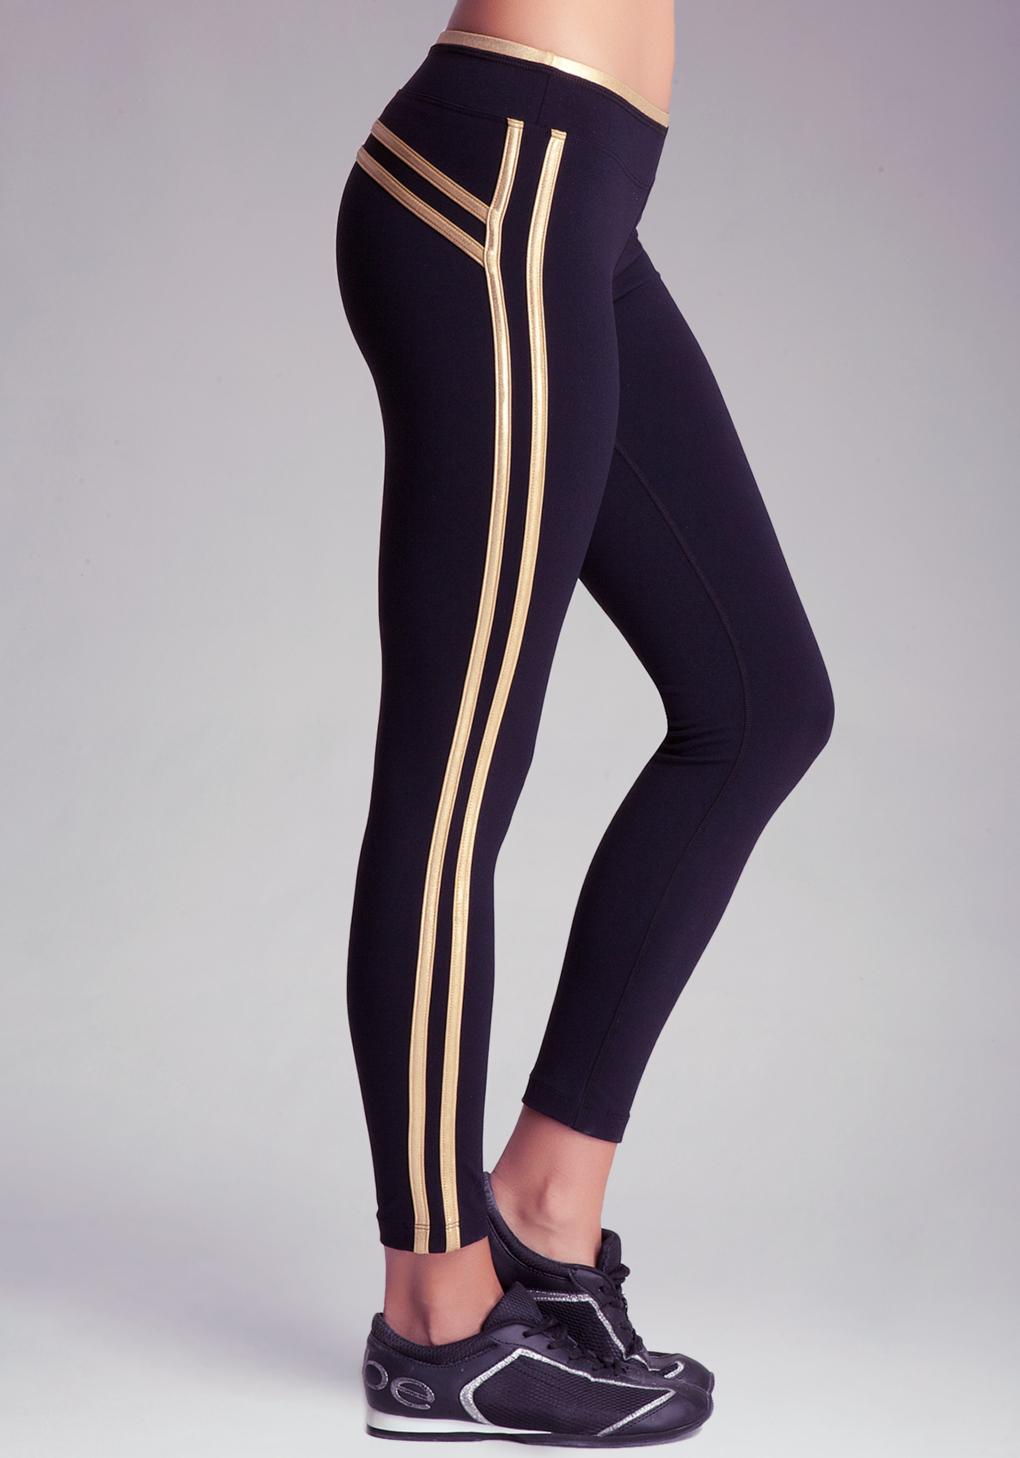 81b3b010639 Bebe Foil Stripe Legging Sport in Black - Lyst